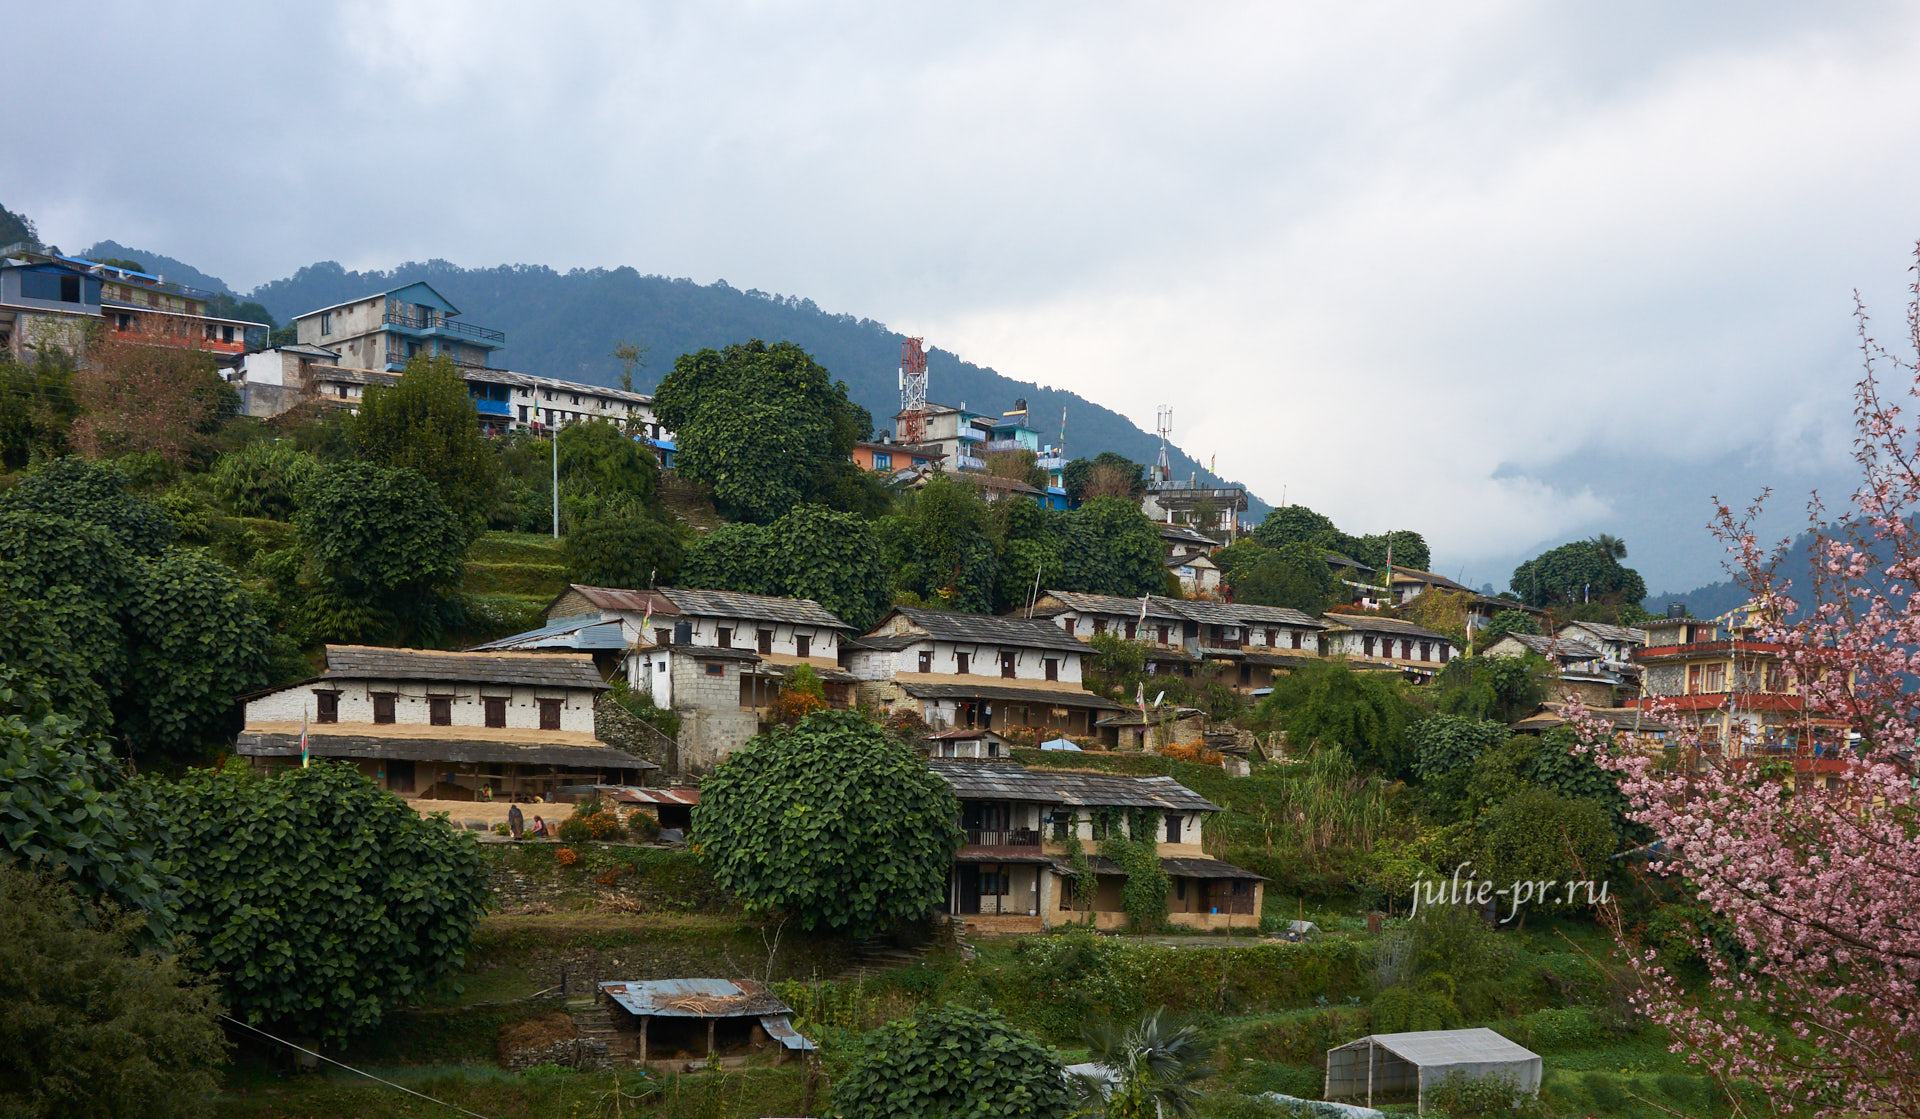 Непал, Пун-Хилл трек, Деревня Гхандрук